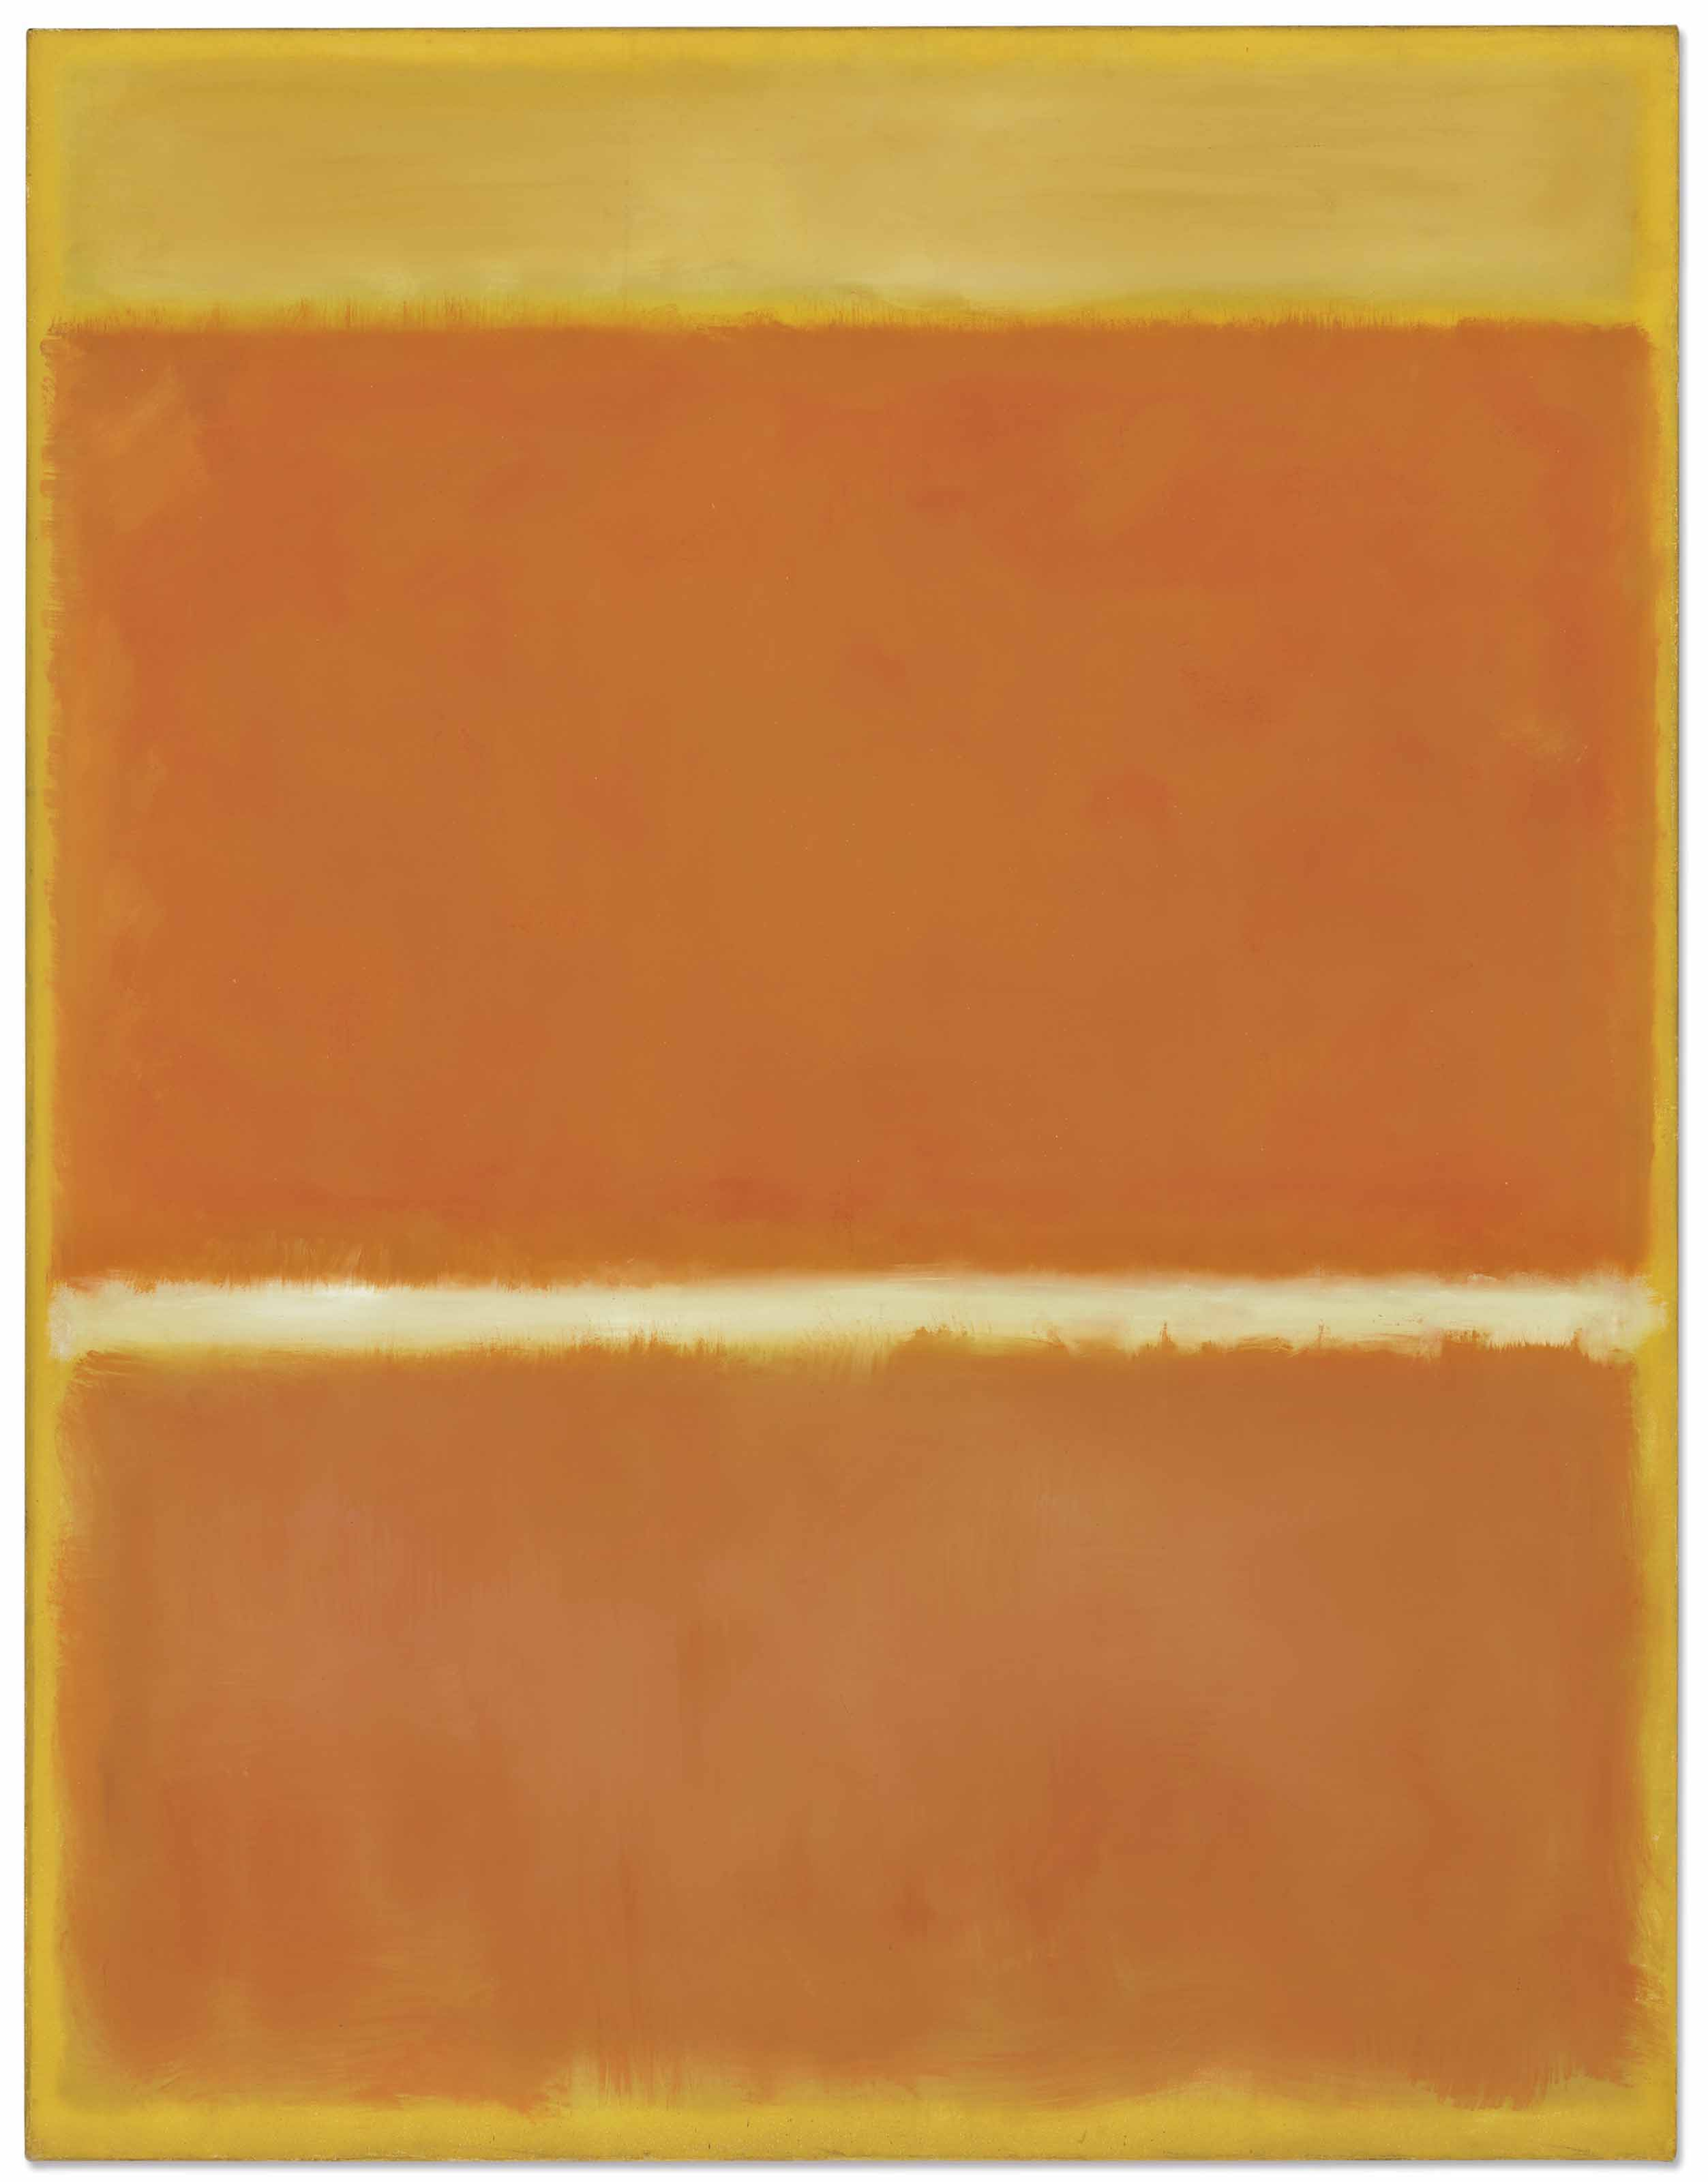 mark rothko saffron painted in 69 x